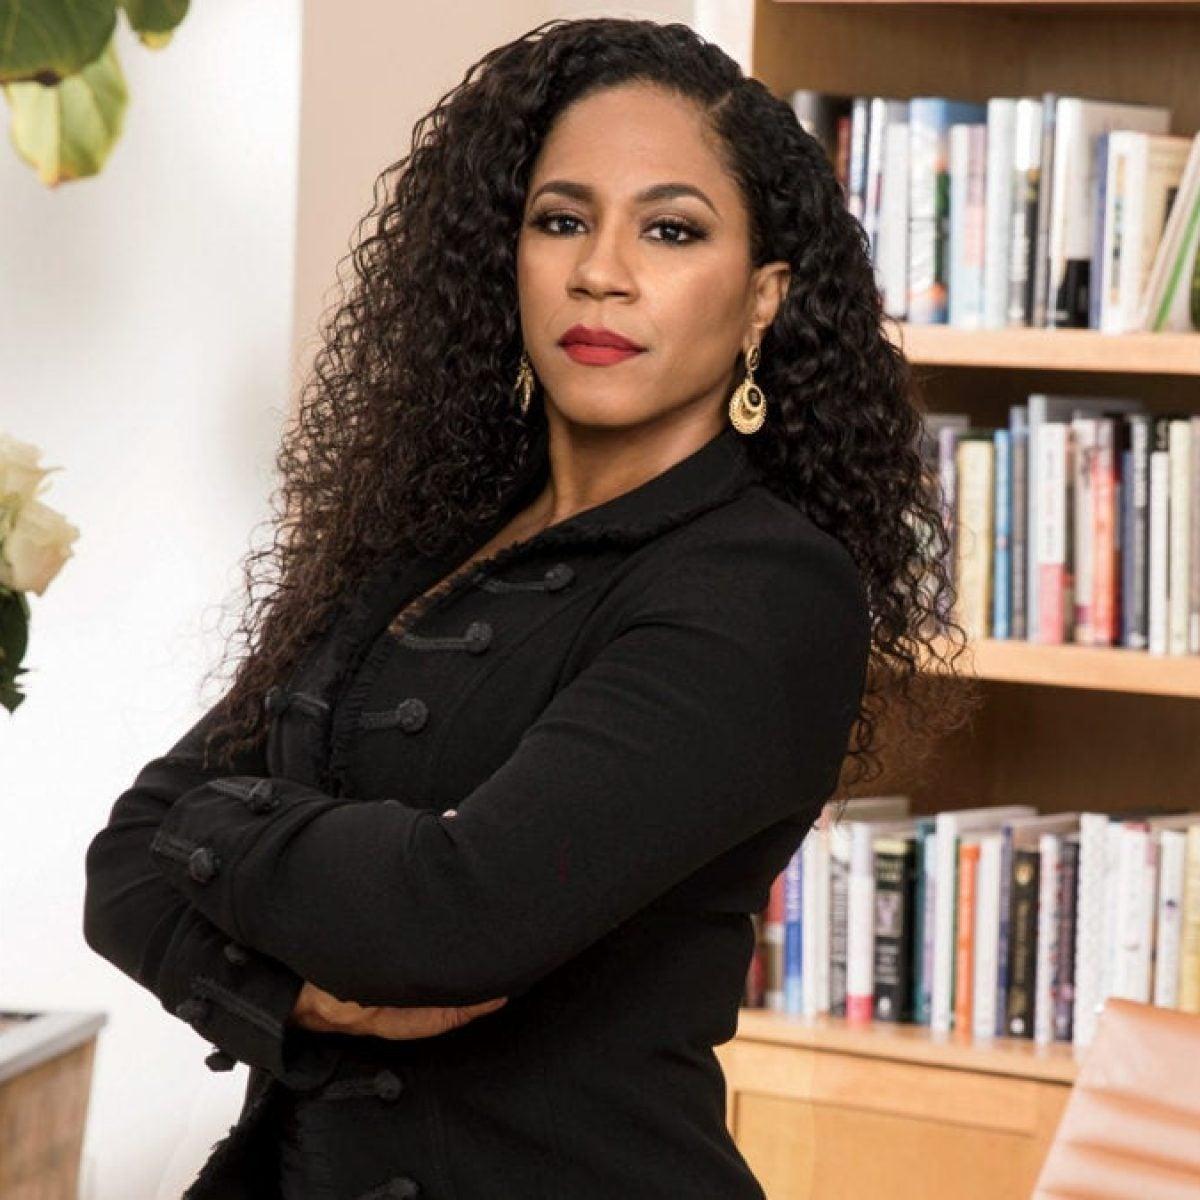 CURLS Founder Mahisha Dellinger Launches New Wealth-Building Initiative To Help 25,000 Black Woman Entrepreneurs